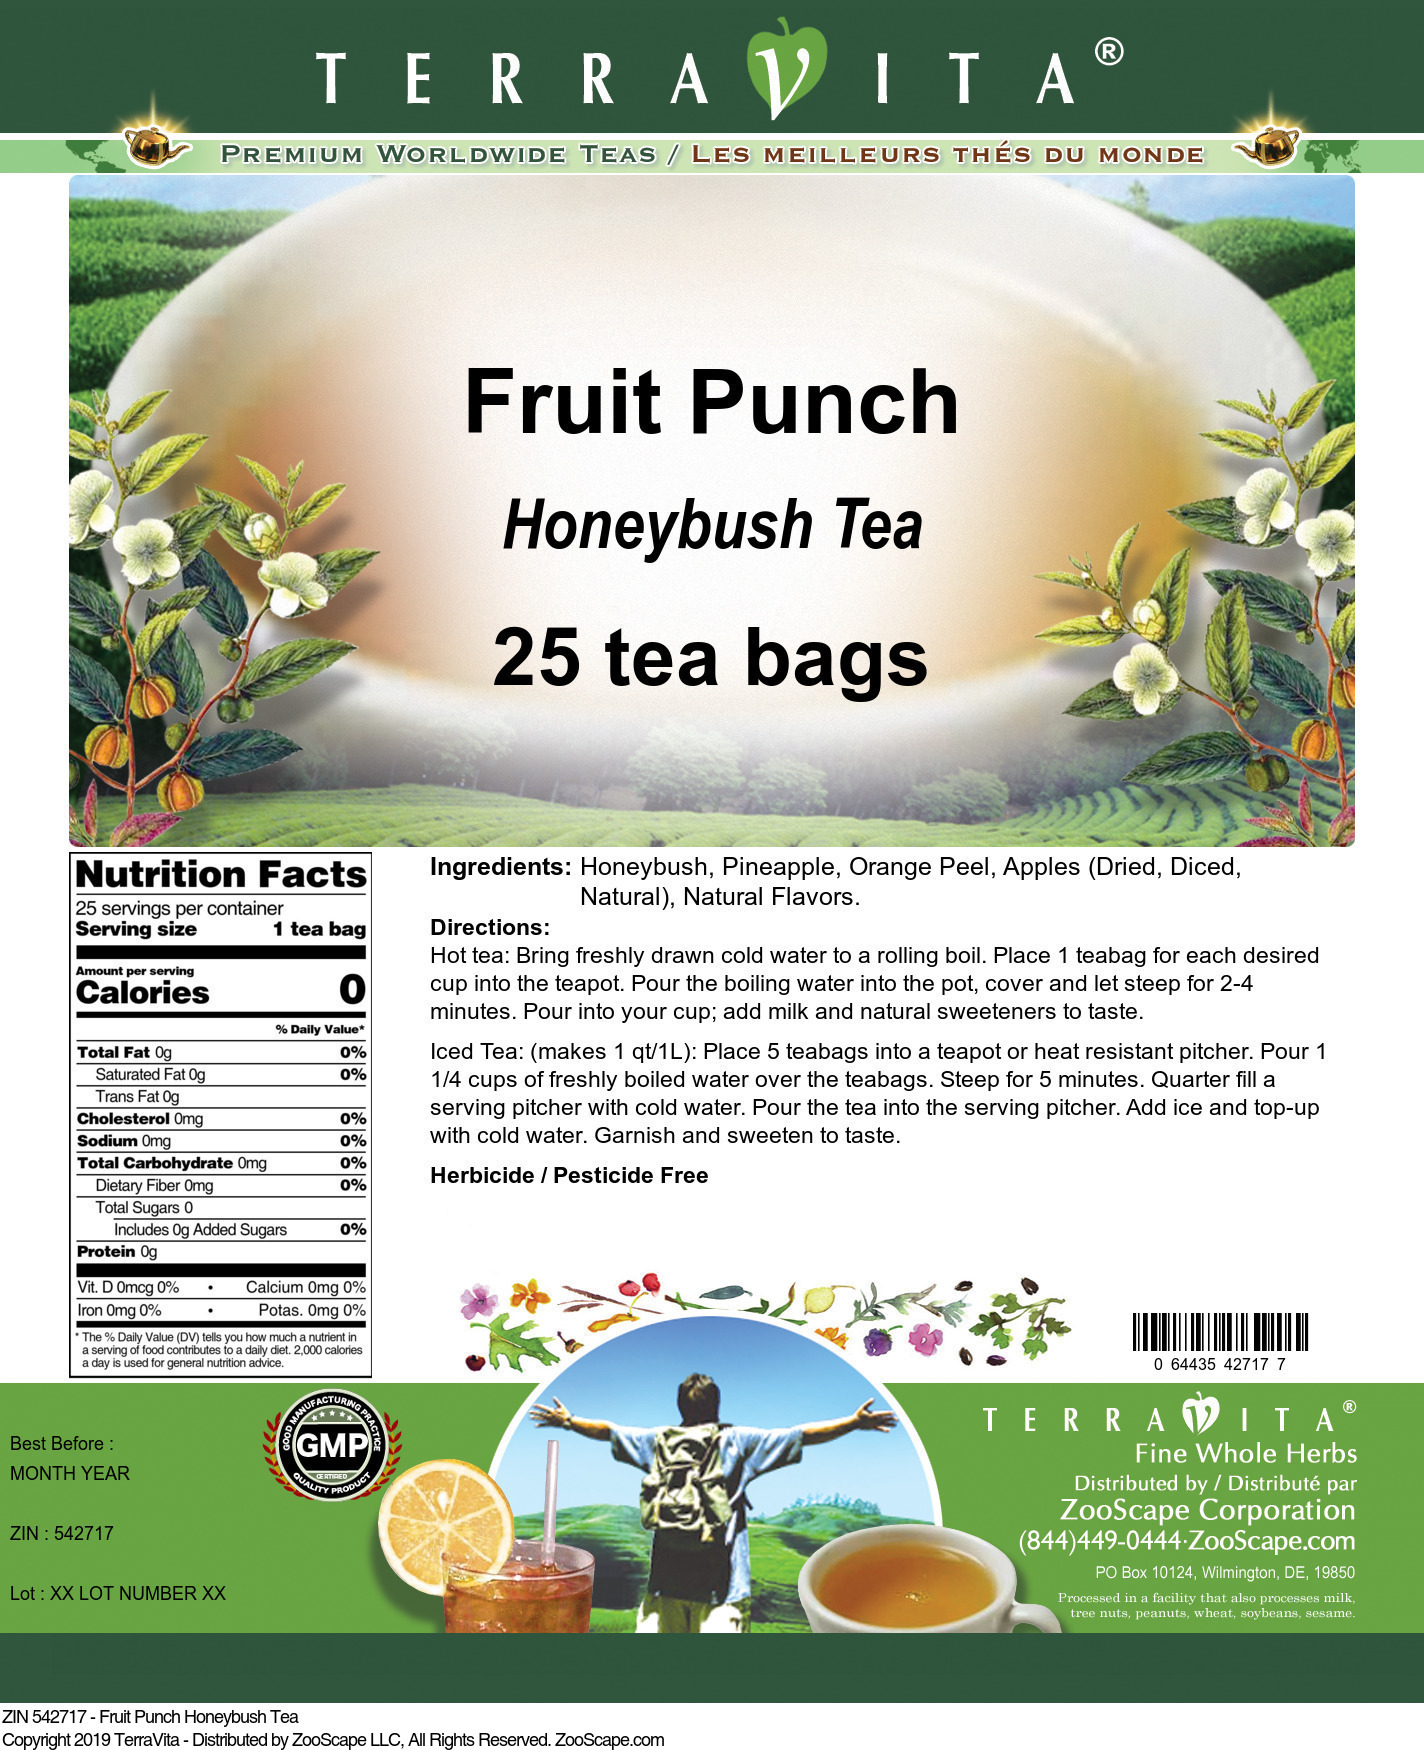 Fruit Punch Honeybush Tea